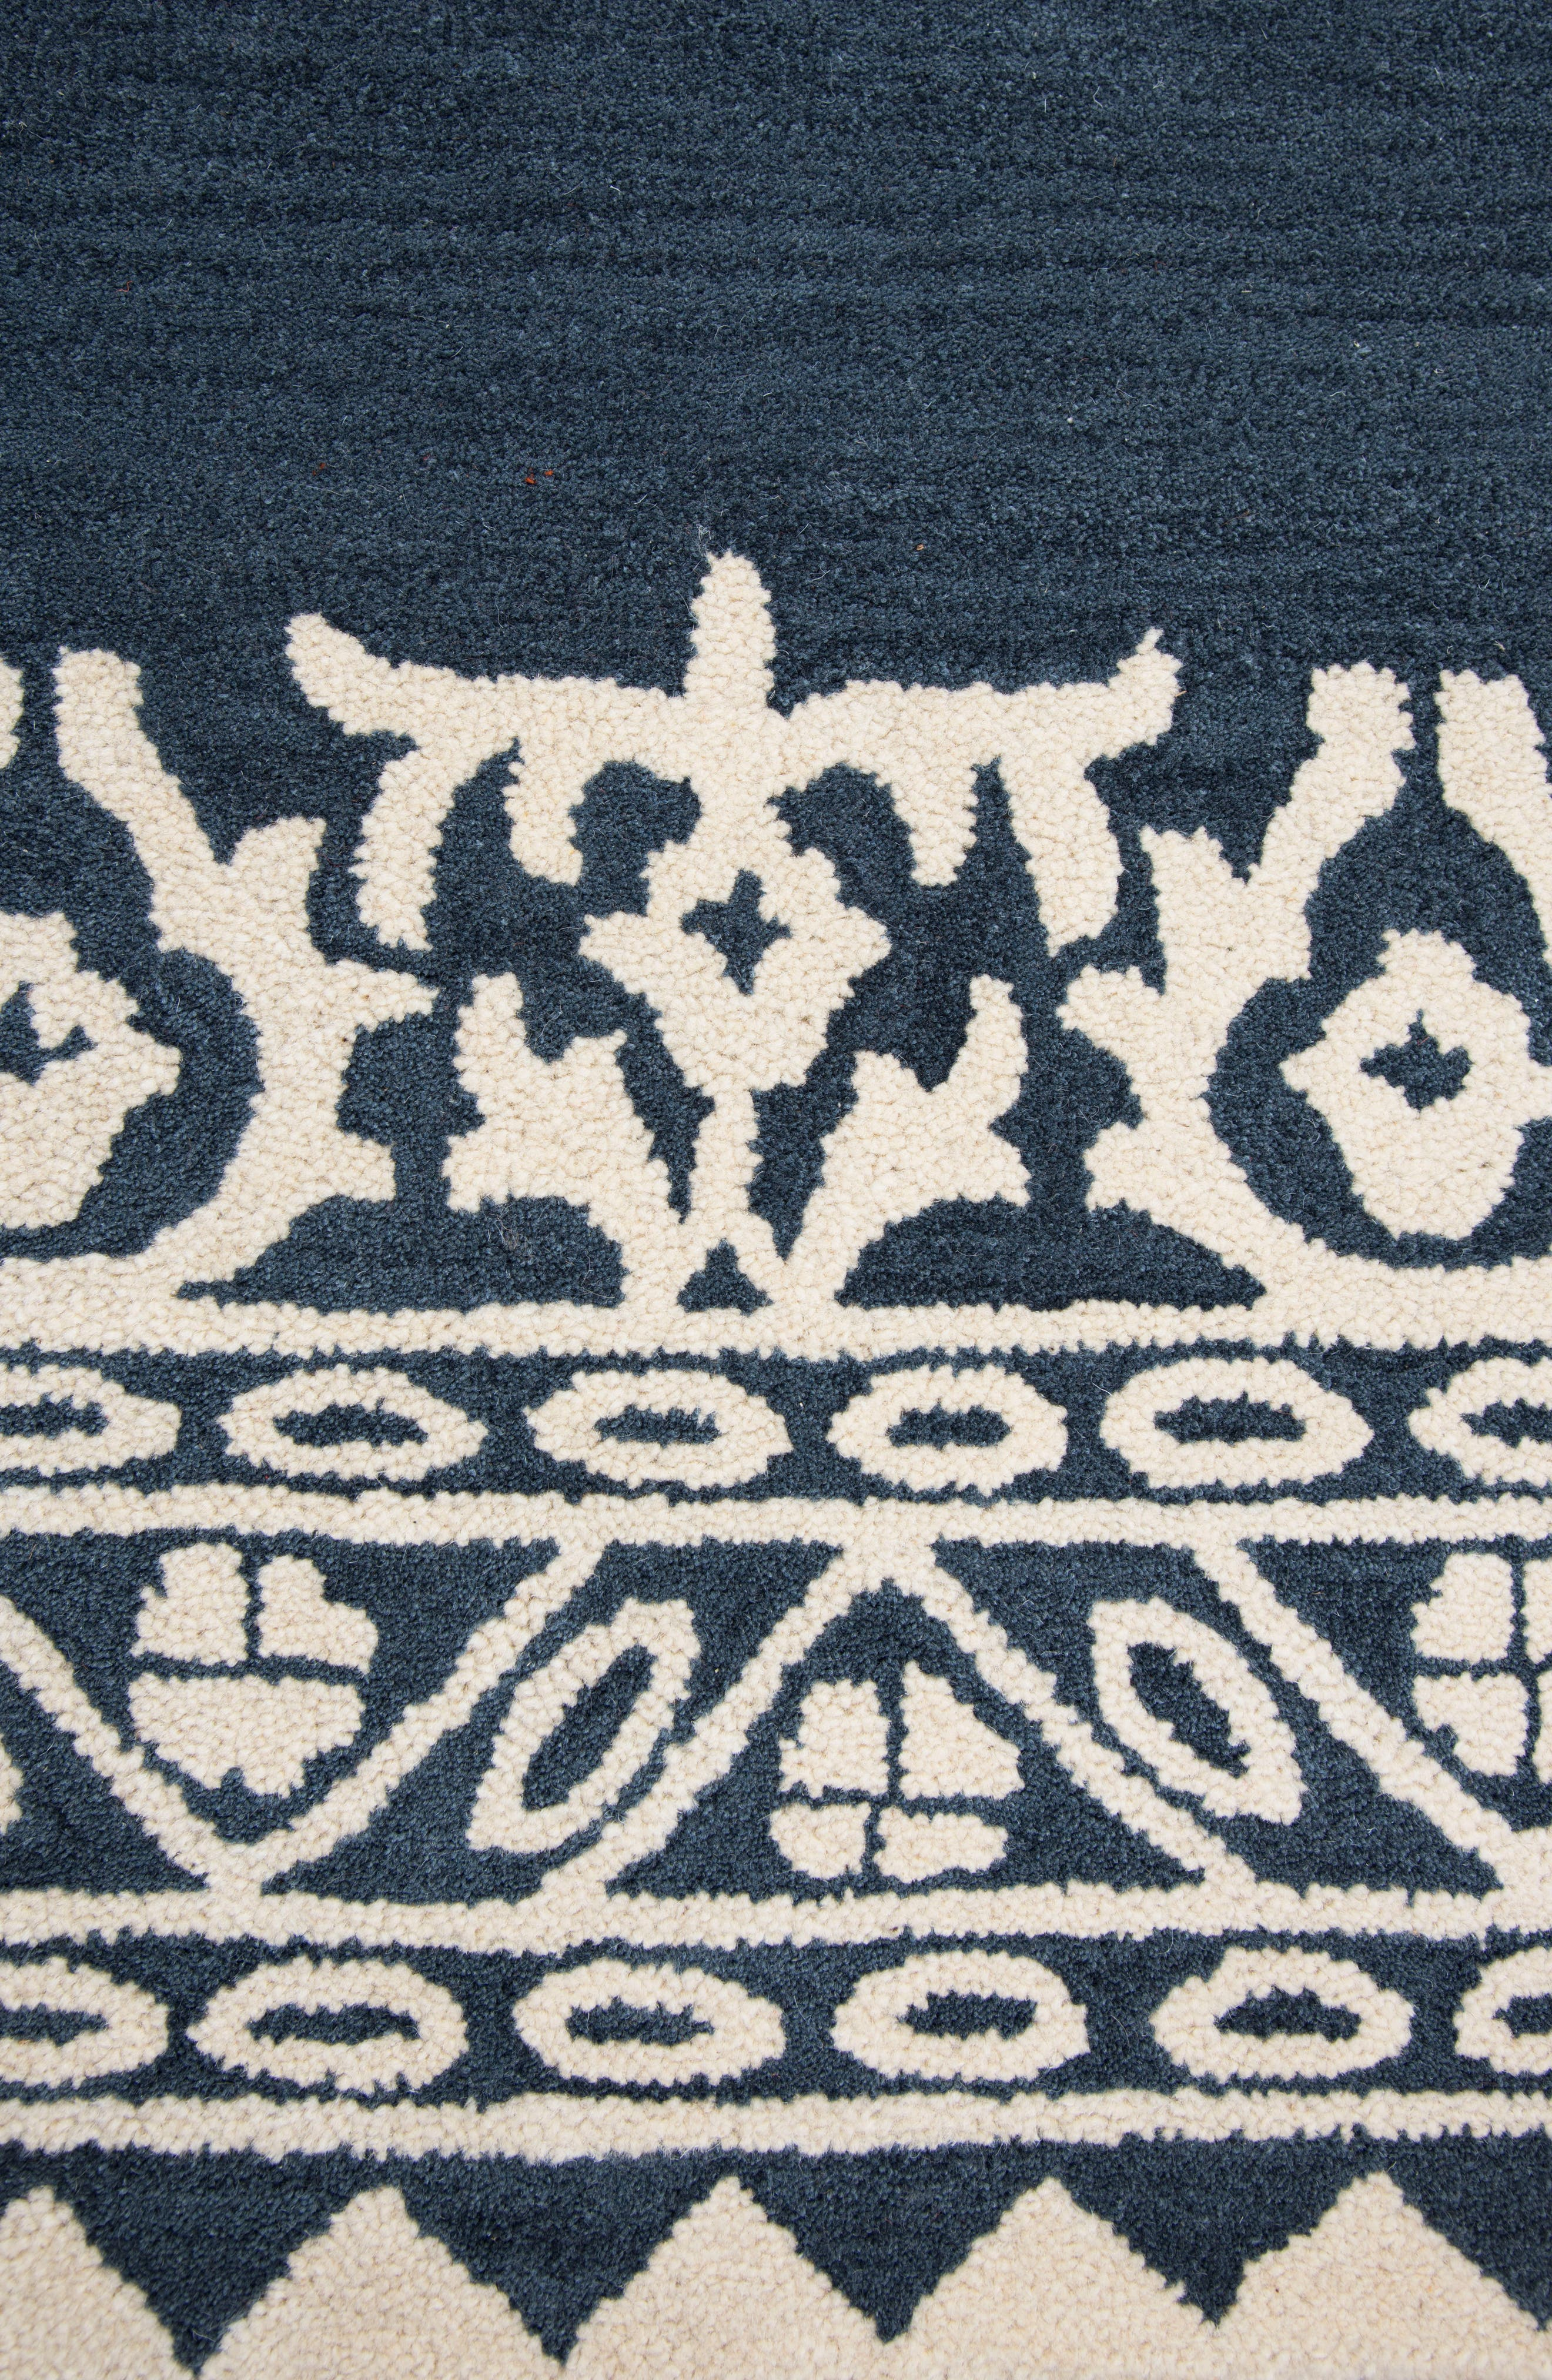 Framed Medallion Hand Tufted Wool Area Rug,                             Alternate thumbnail 2, color,                             400